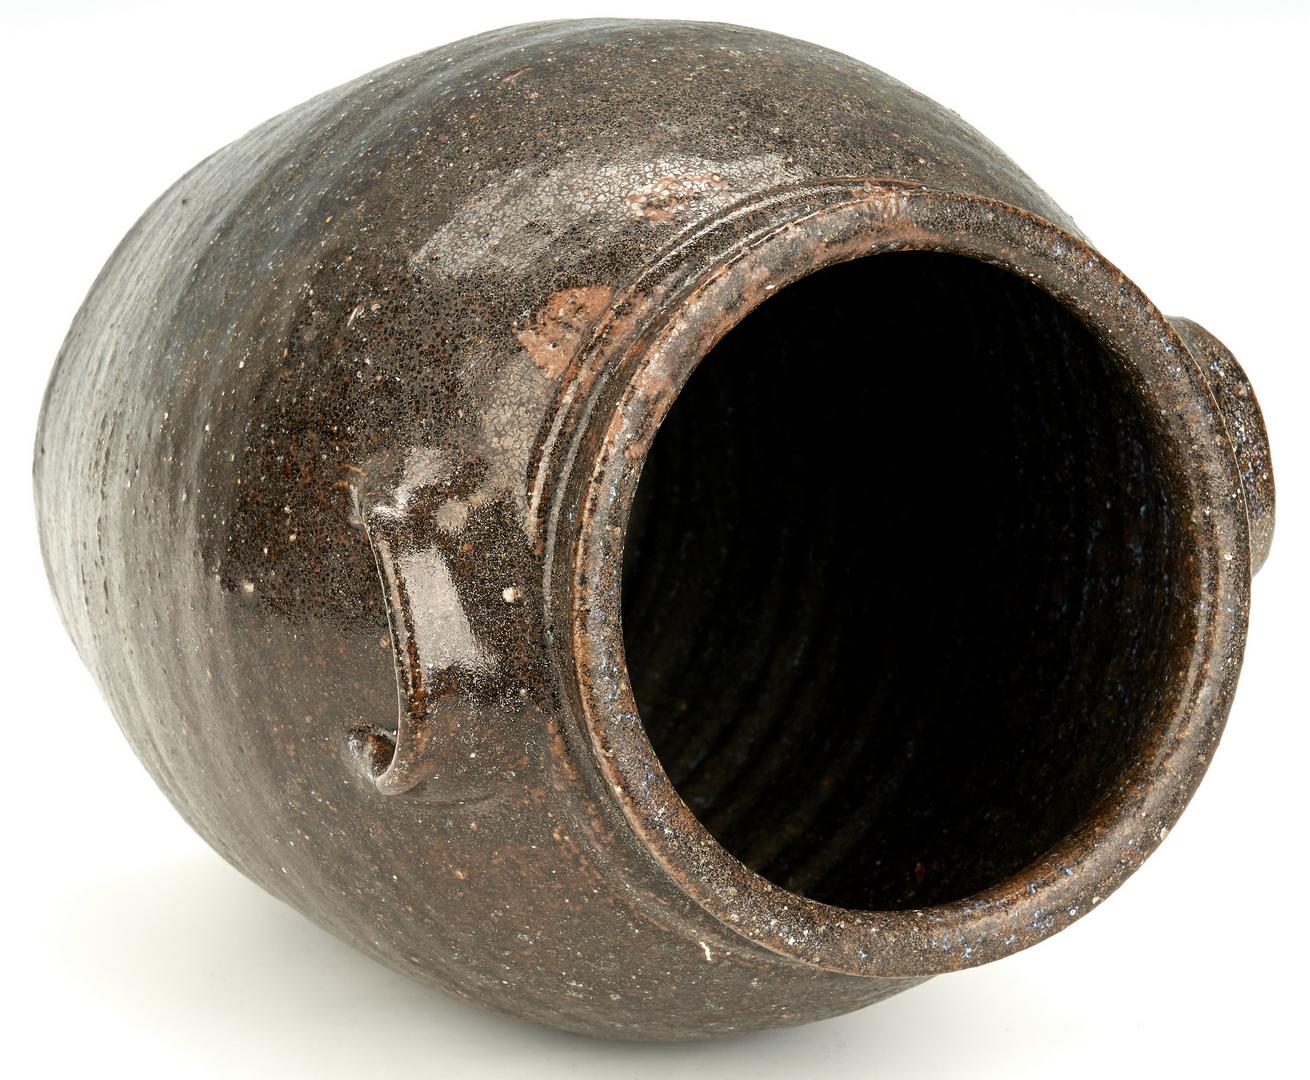 Lot 859: 3 NC Alkaline Glazed Pottery Jars